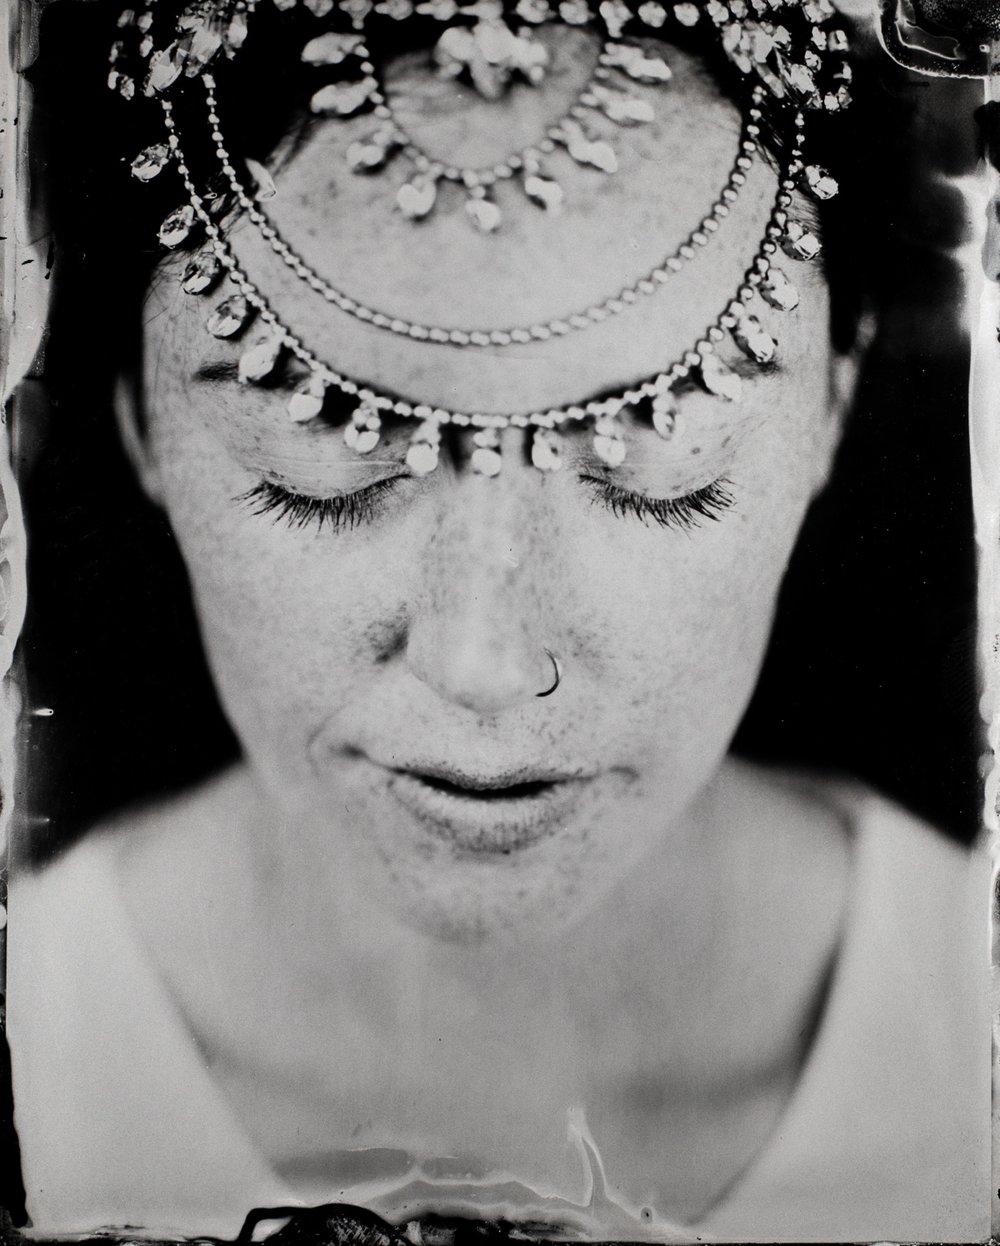 alternative photographic processes